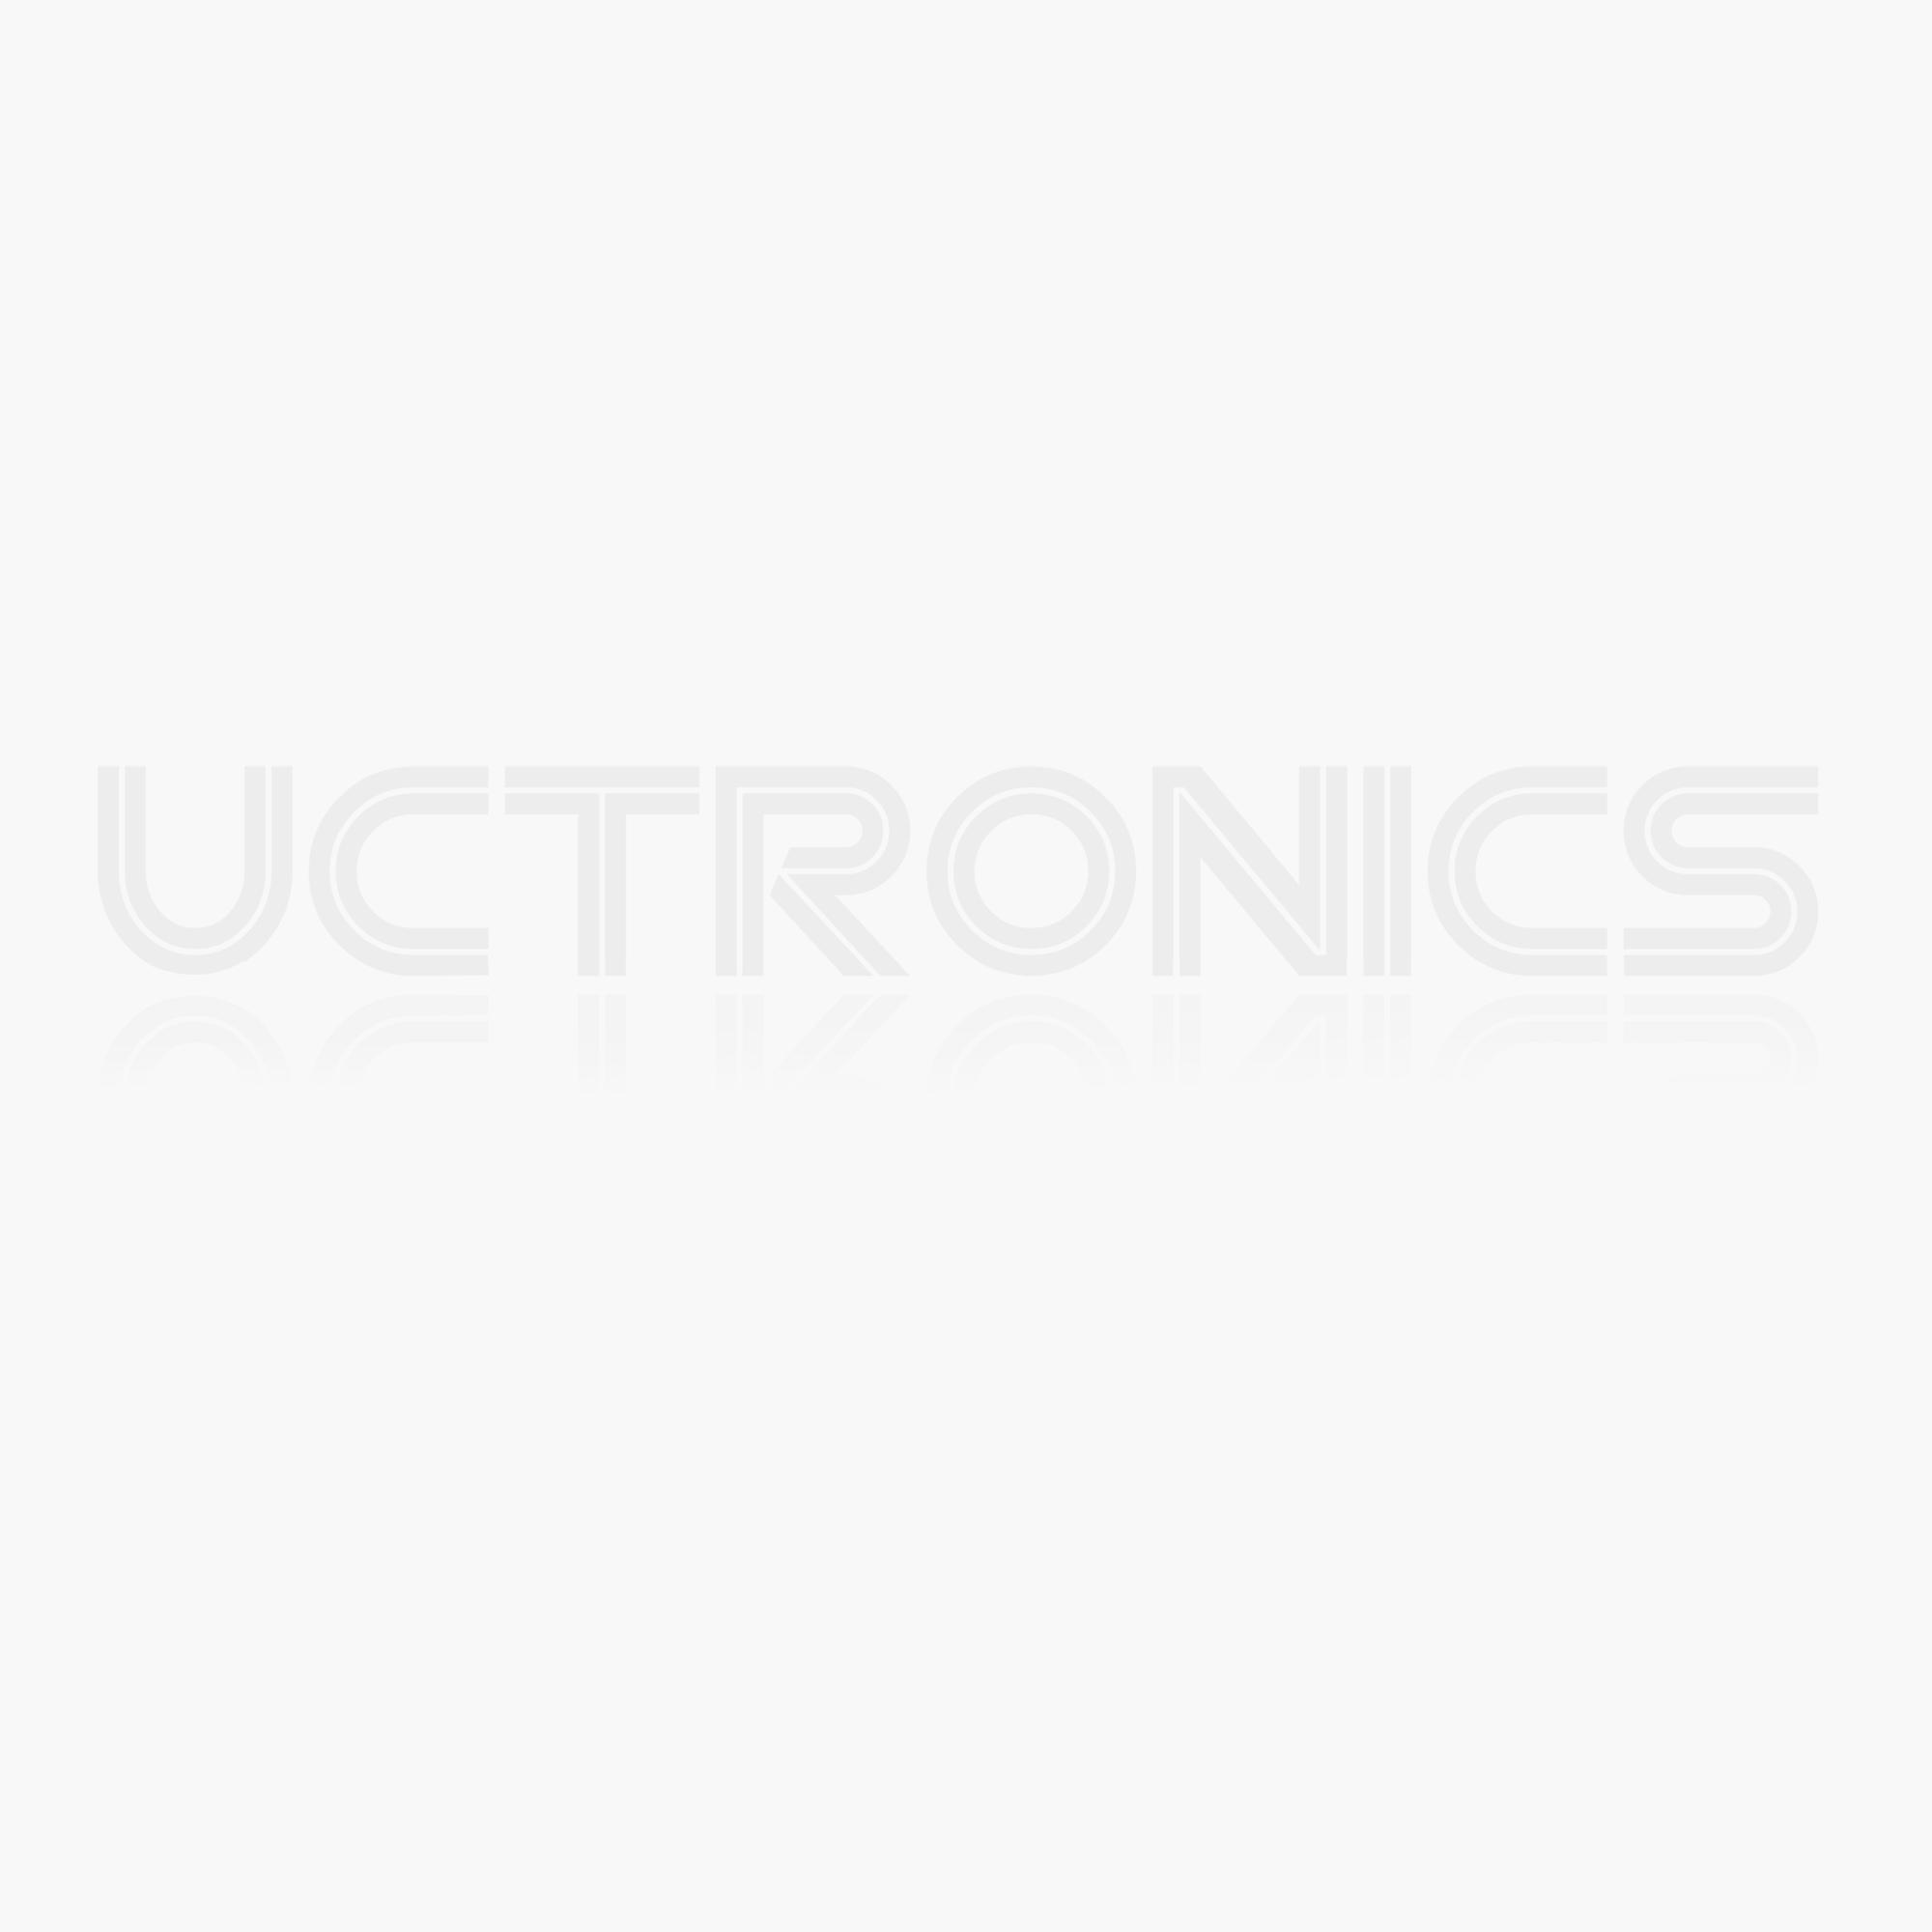 OV9281 1MP Global Shutter USB 2.0 Camera